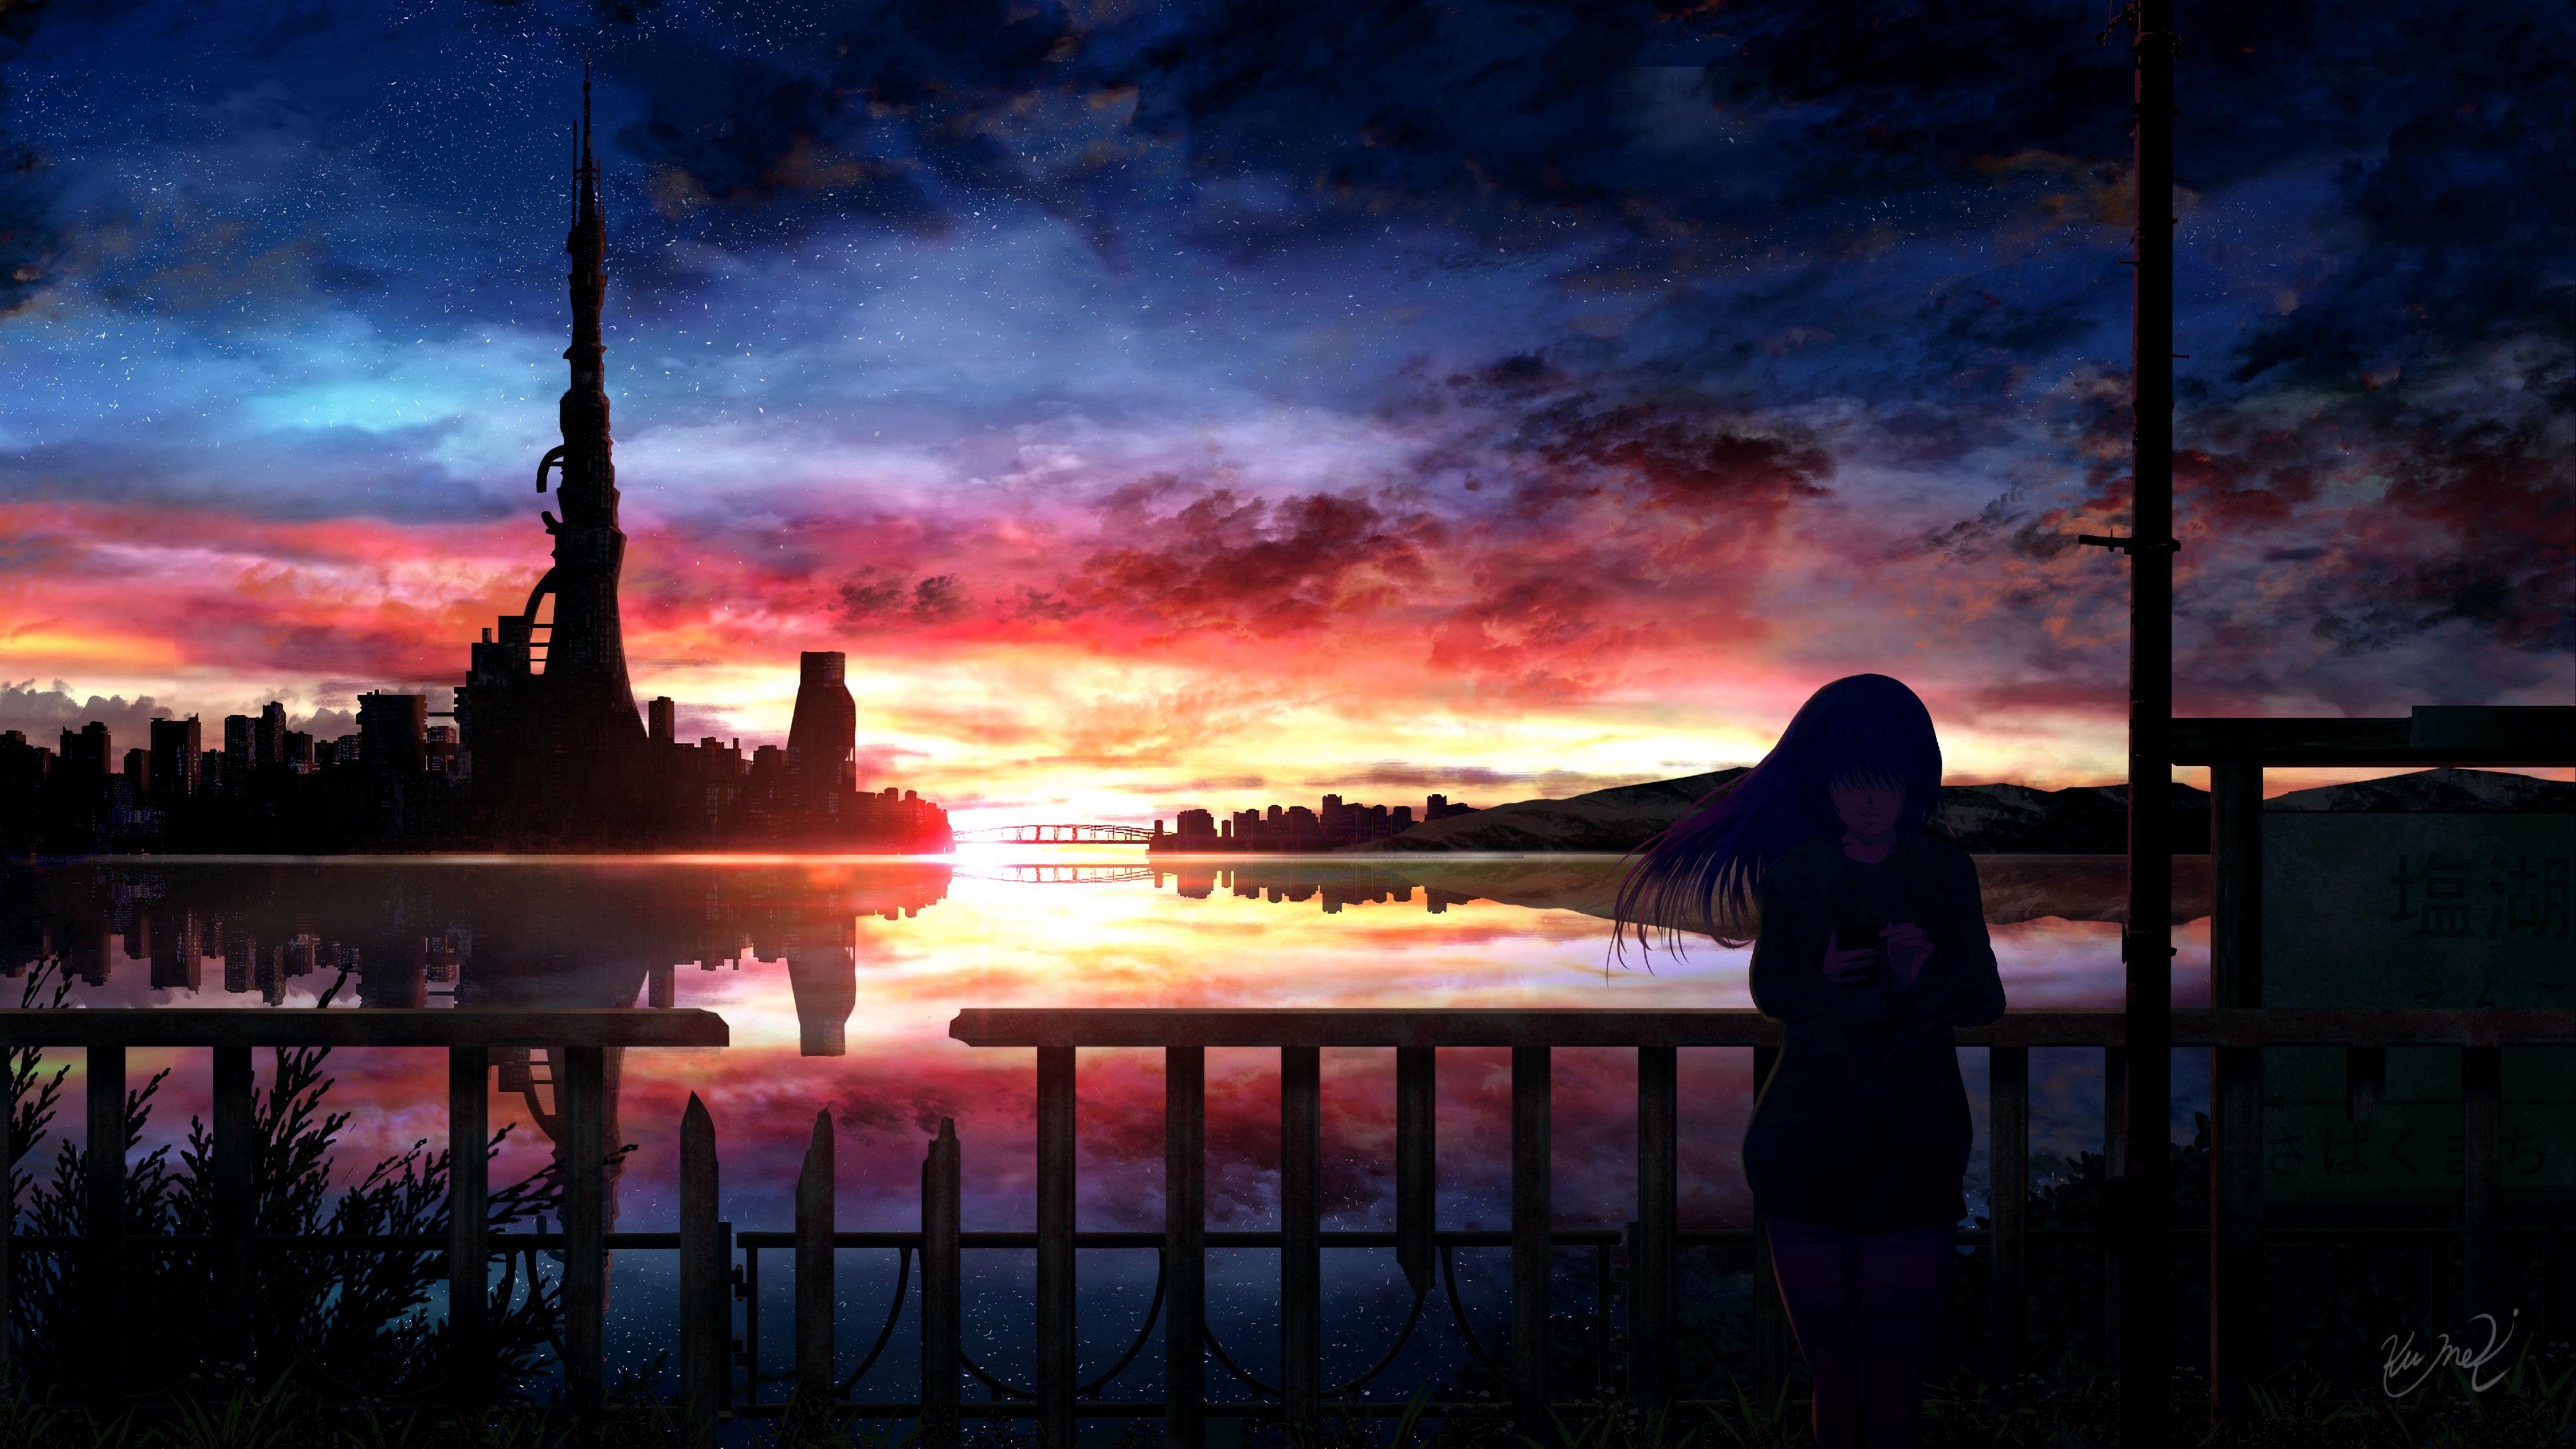 Silhouette Night 4k Wallpaper Night Sky Wallpaper Anime Backgrounds Wallpapers Hd Anime Wallpapers 27 anime wallpaper hd